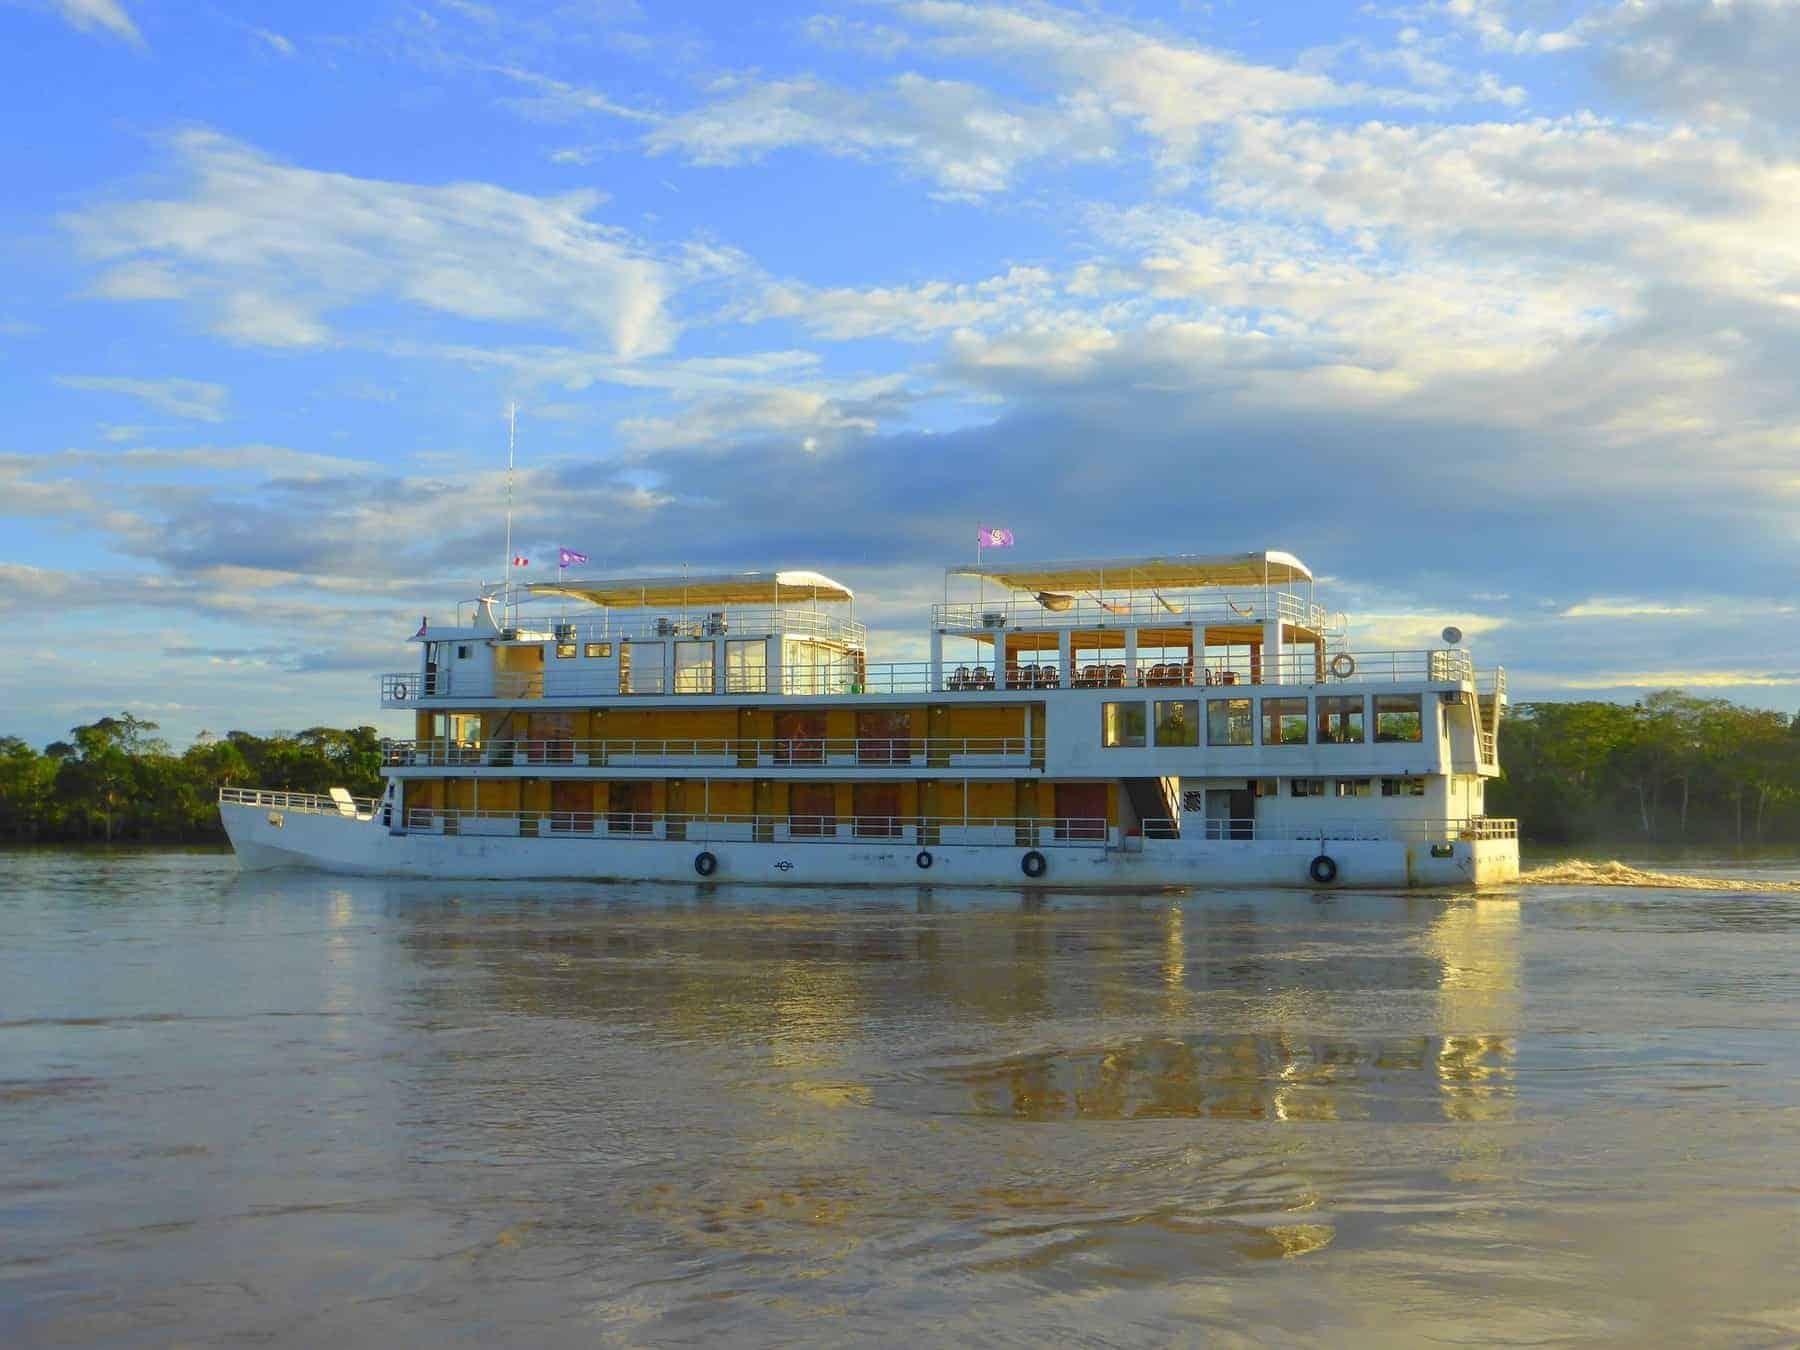 The riverboat Queen Violeta cruising along the River Amazon in Peru.